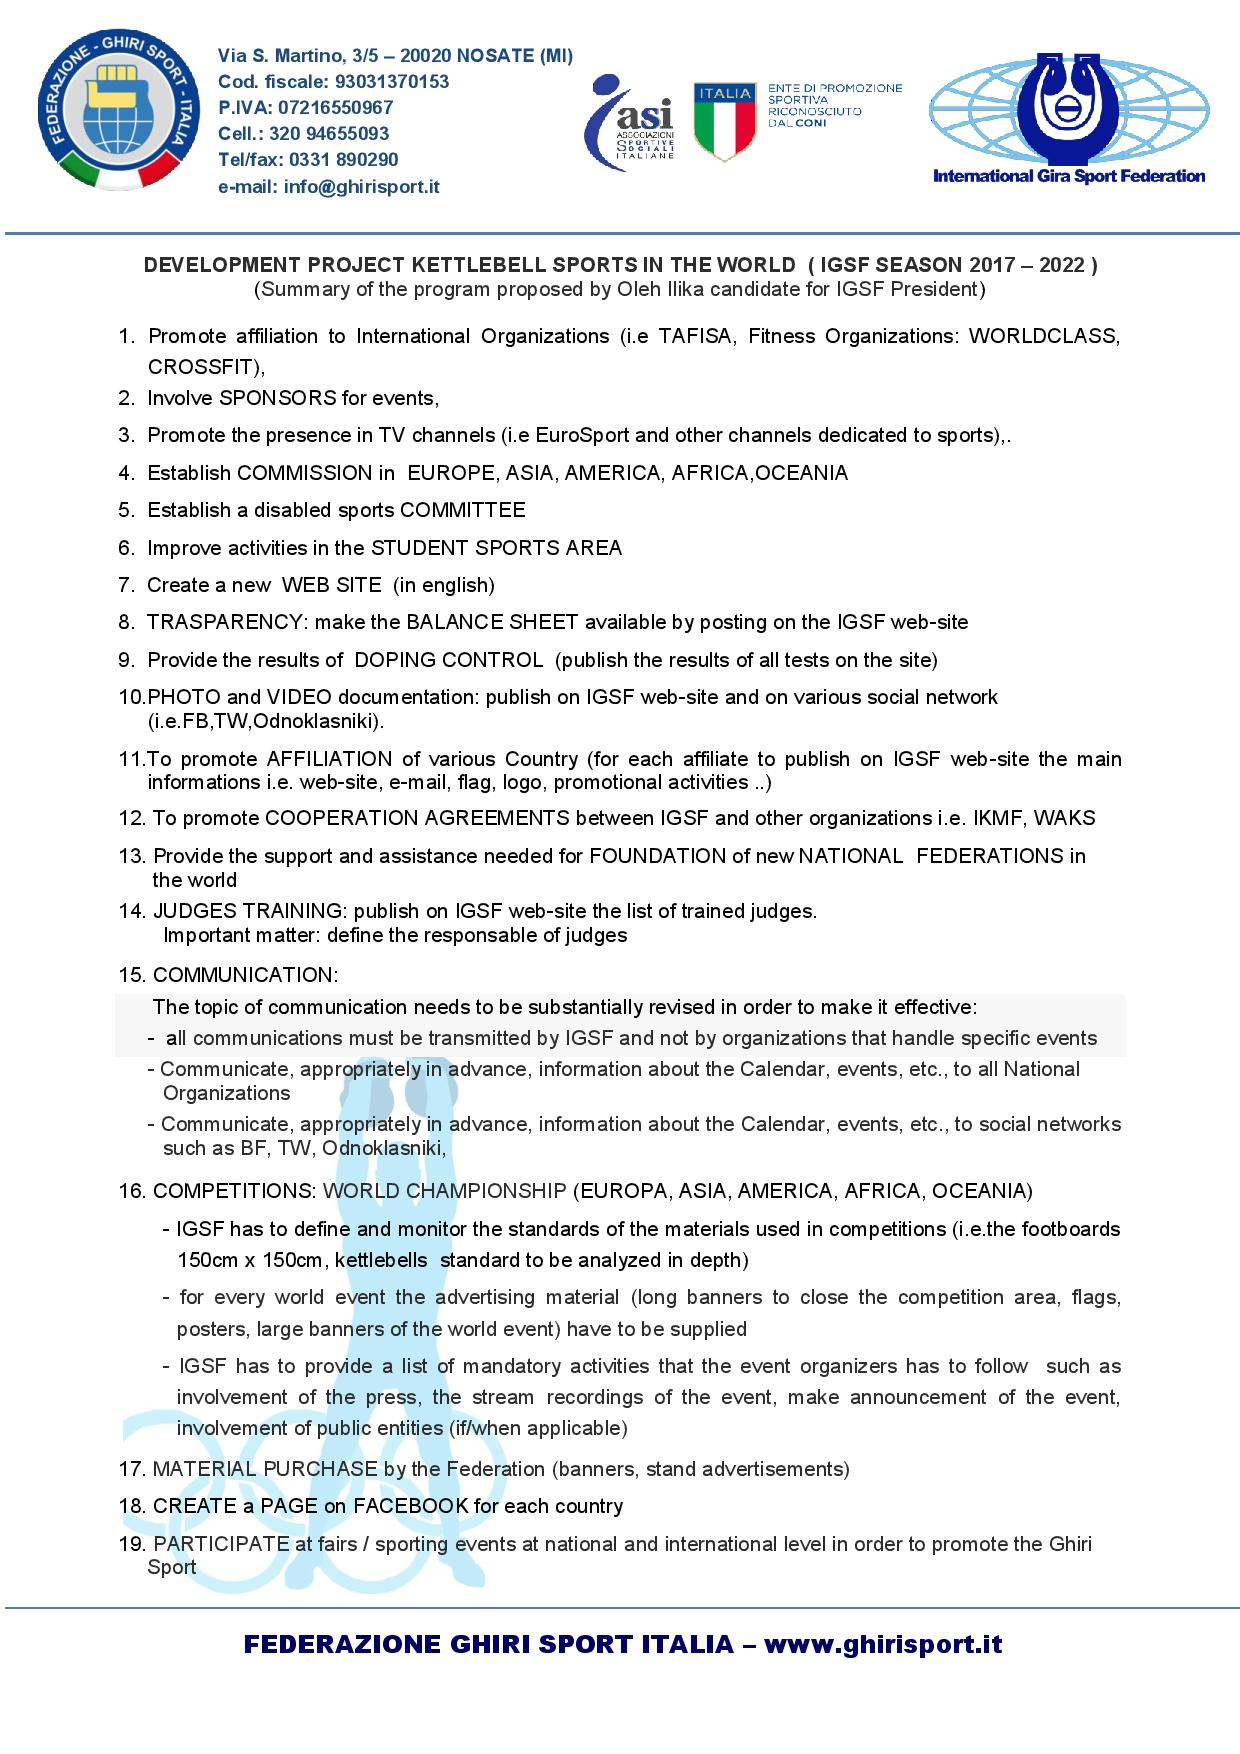 Progetto candidatura IGSF Oleh Ilika_03-08-2017a-ENG